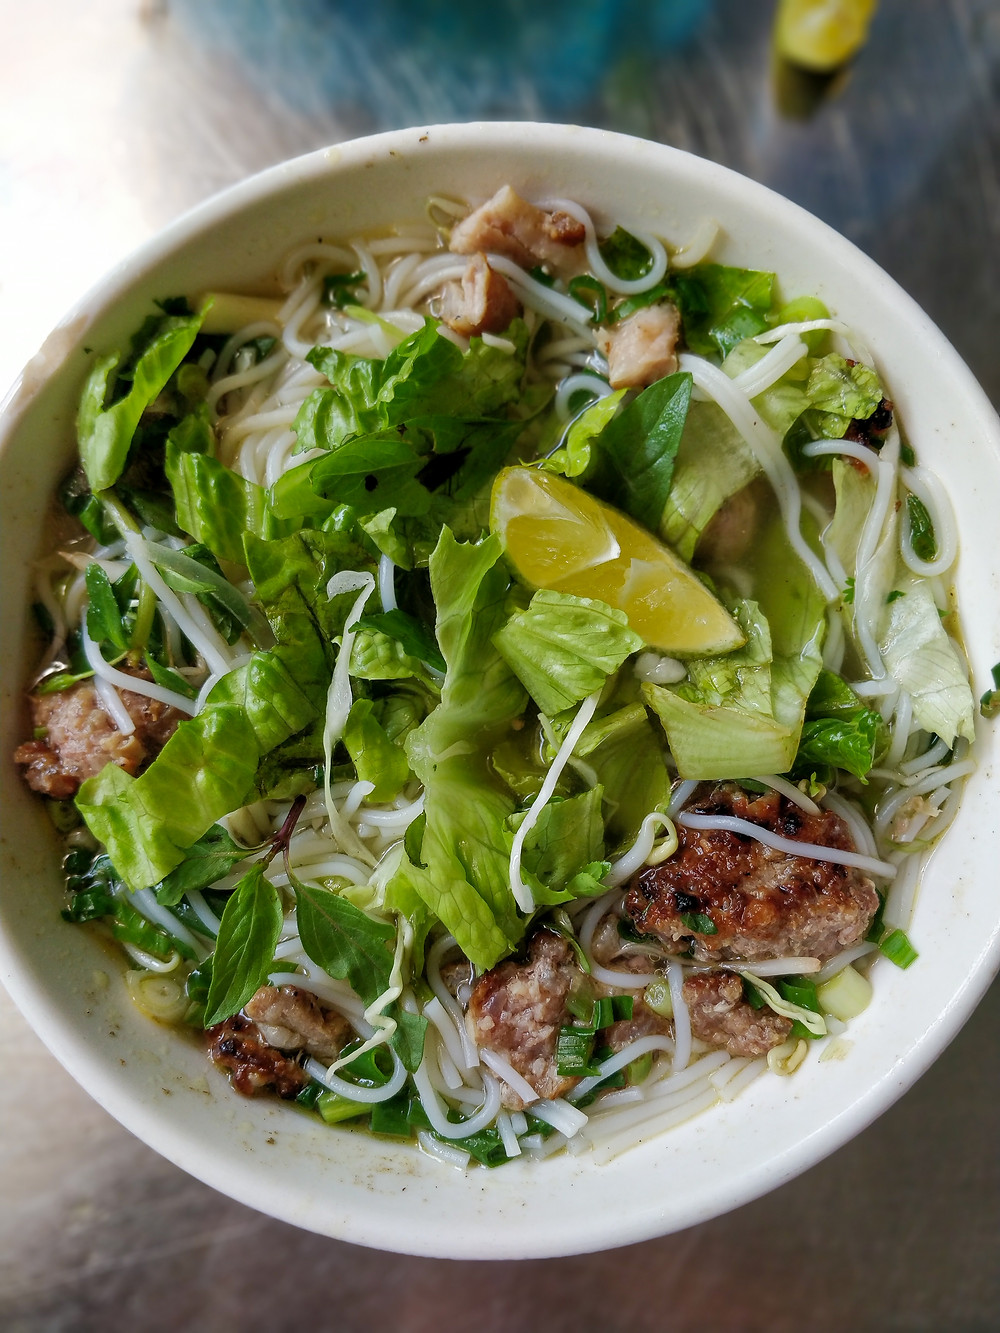 Bun cha Mai Chau's signature dish